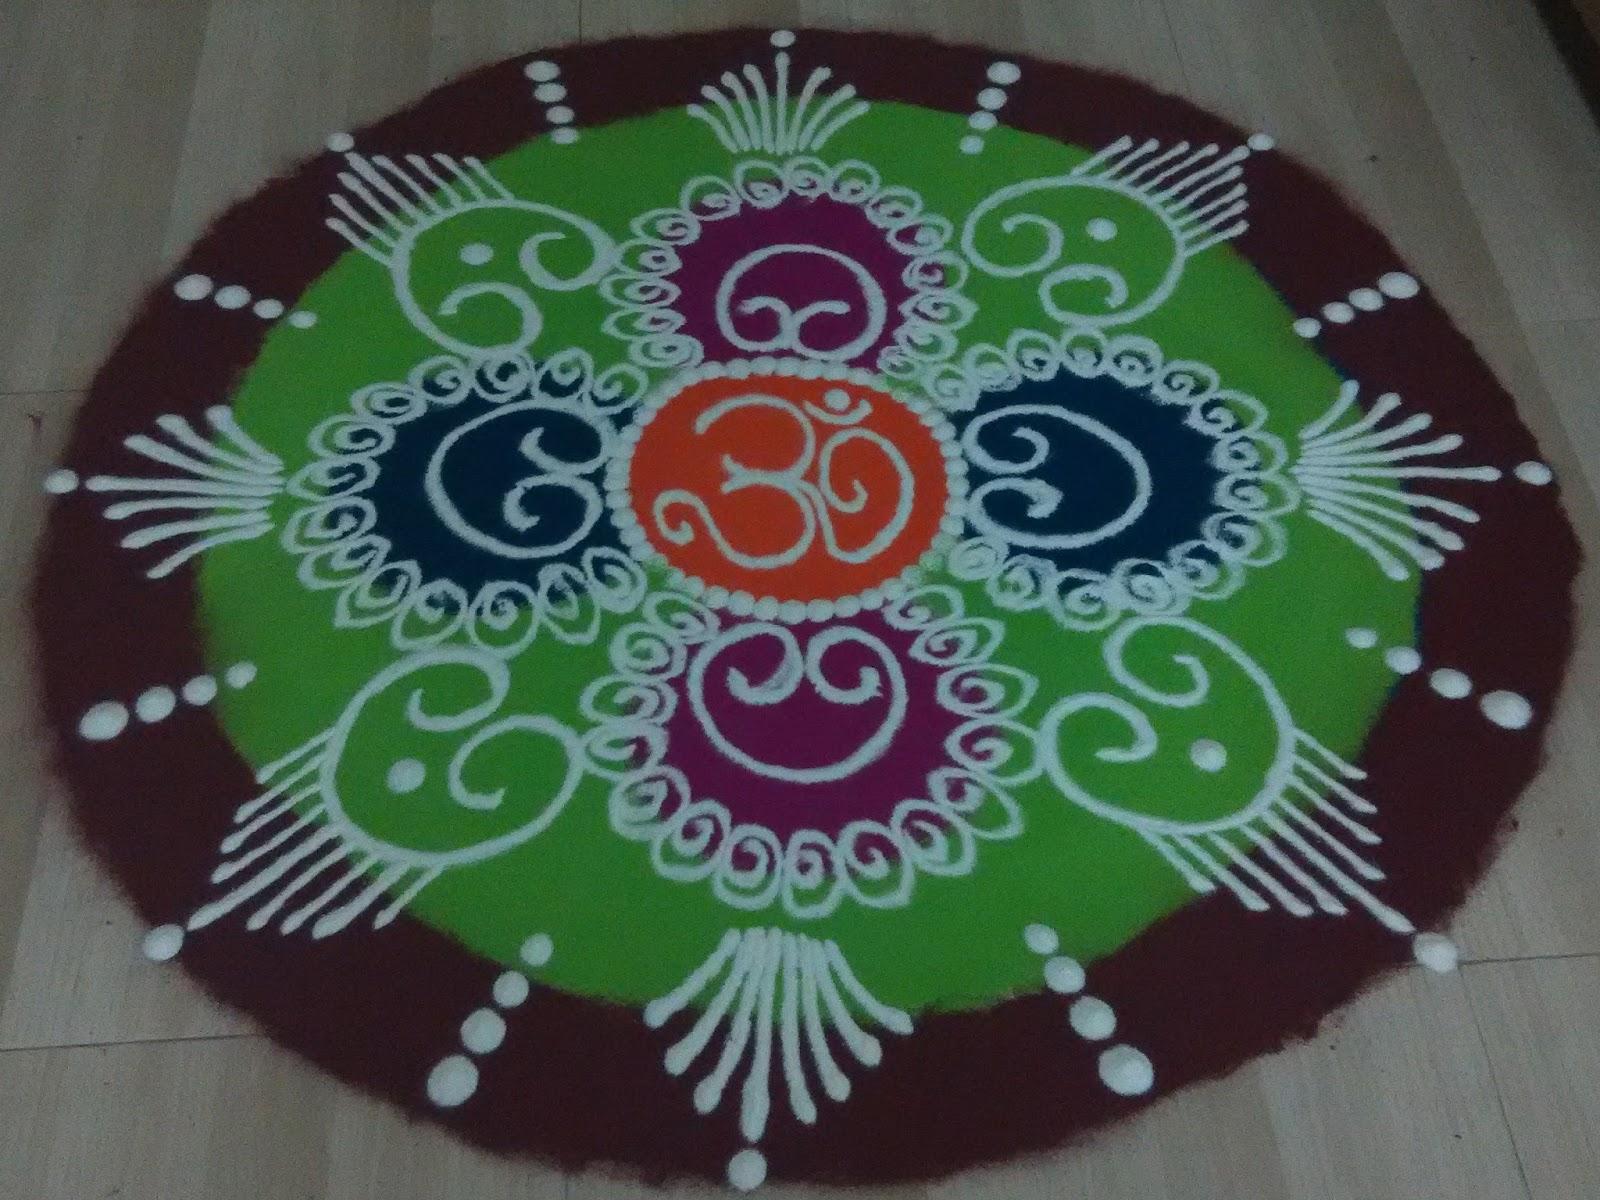 Communication on this topic: 10 Best Sanskar Bharti Rangoli Designs To , 10-best-sanskar-bharti-rangoli-designs-to/